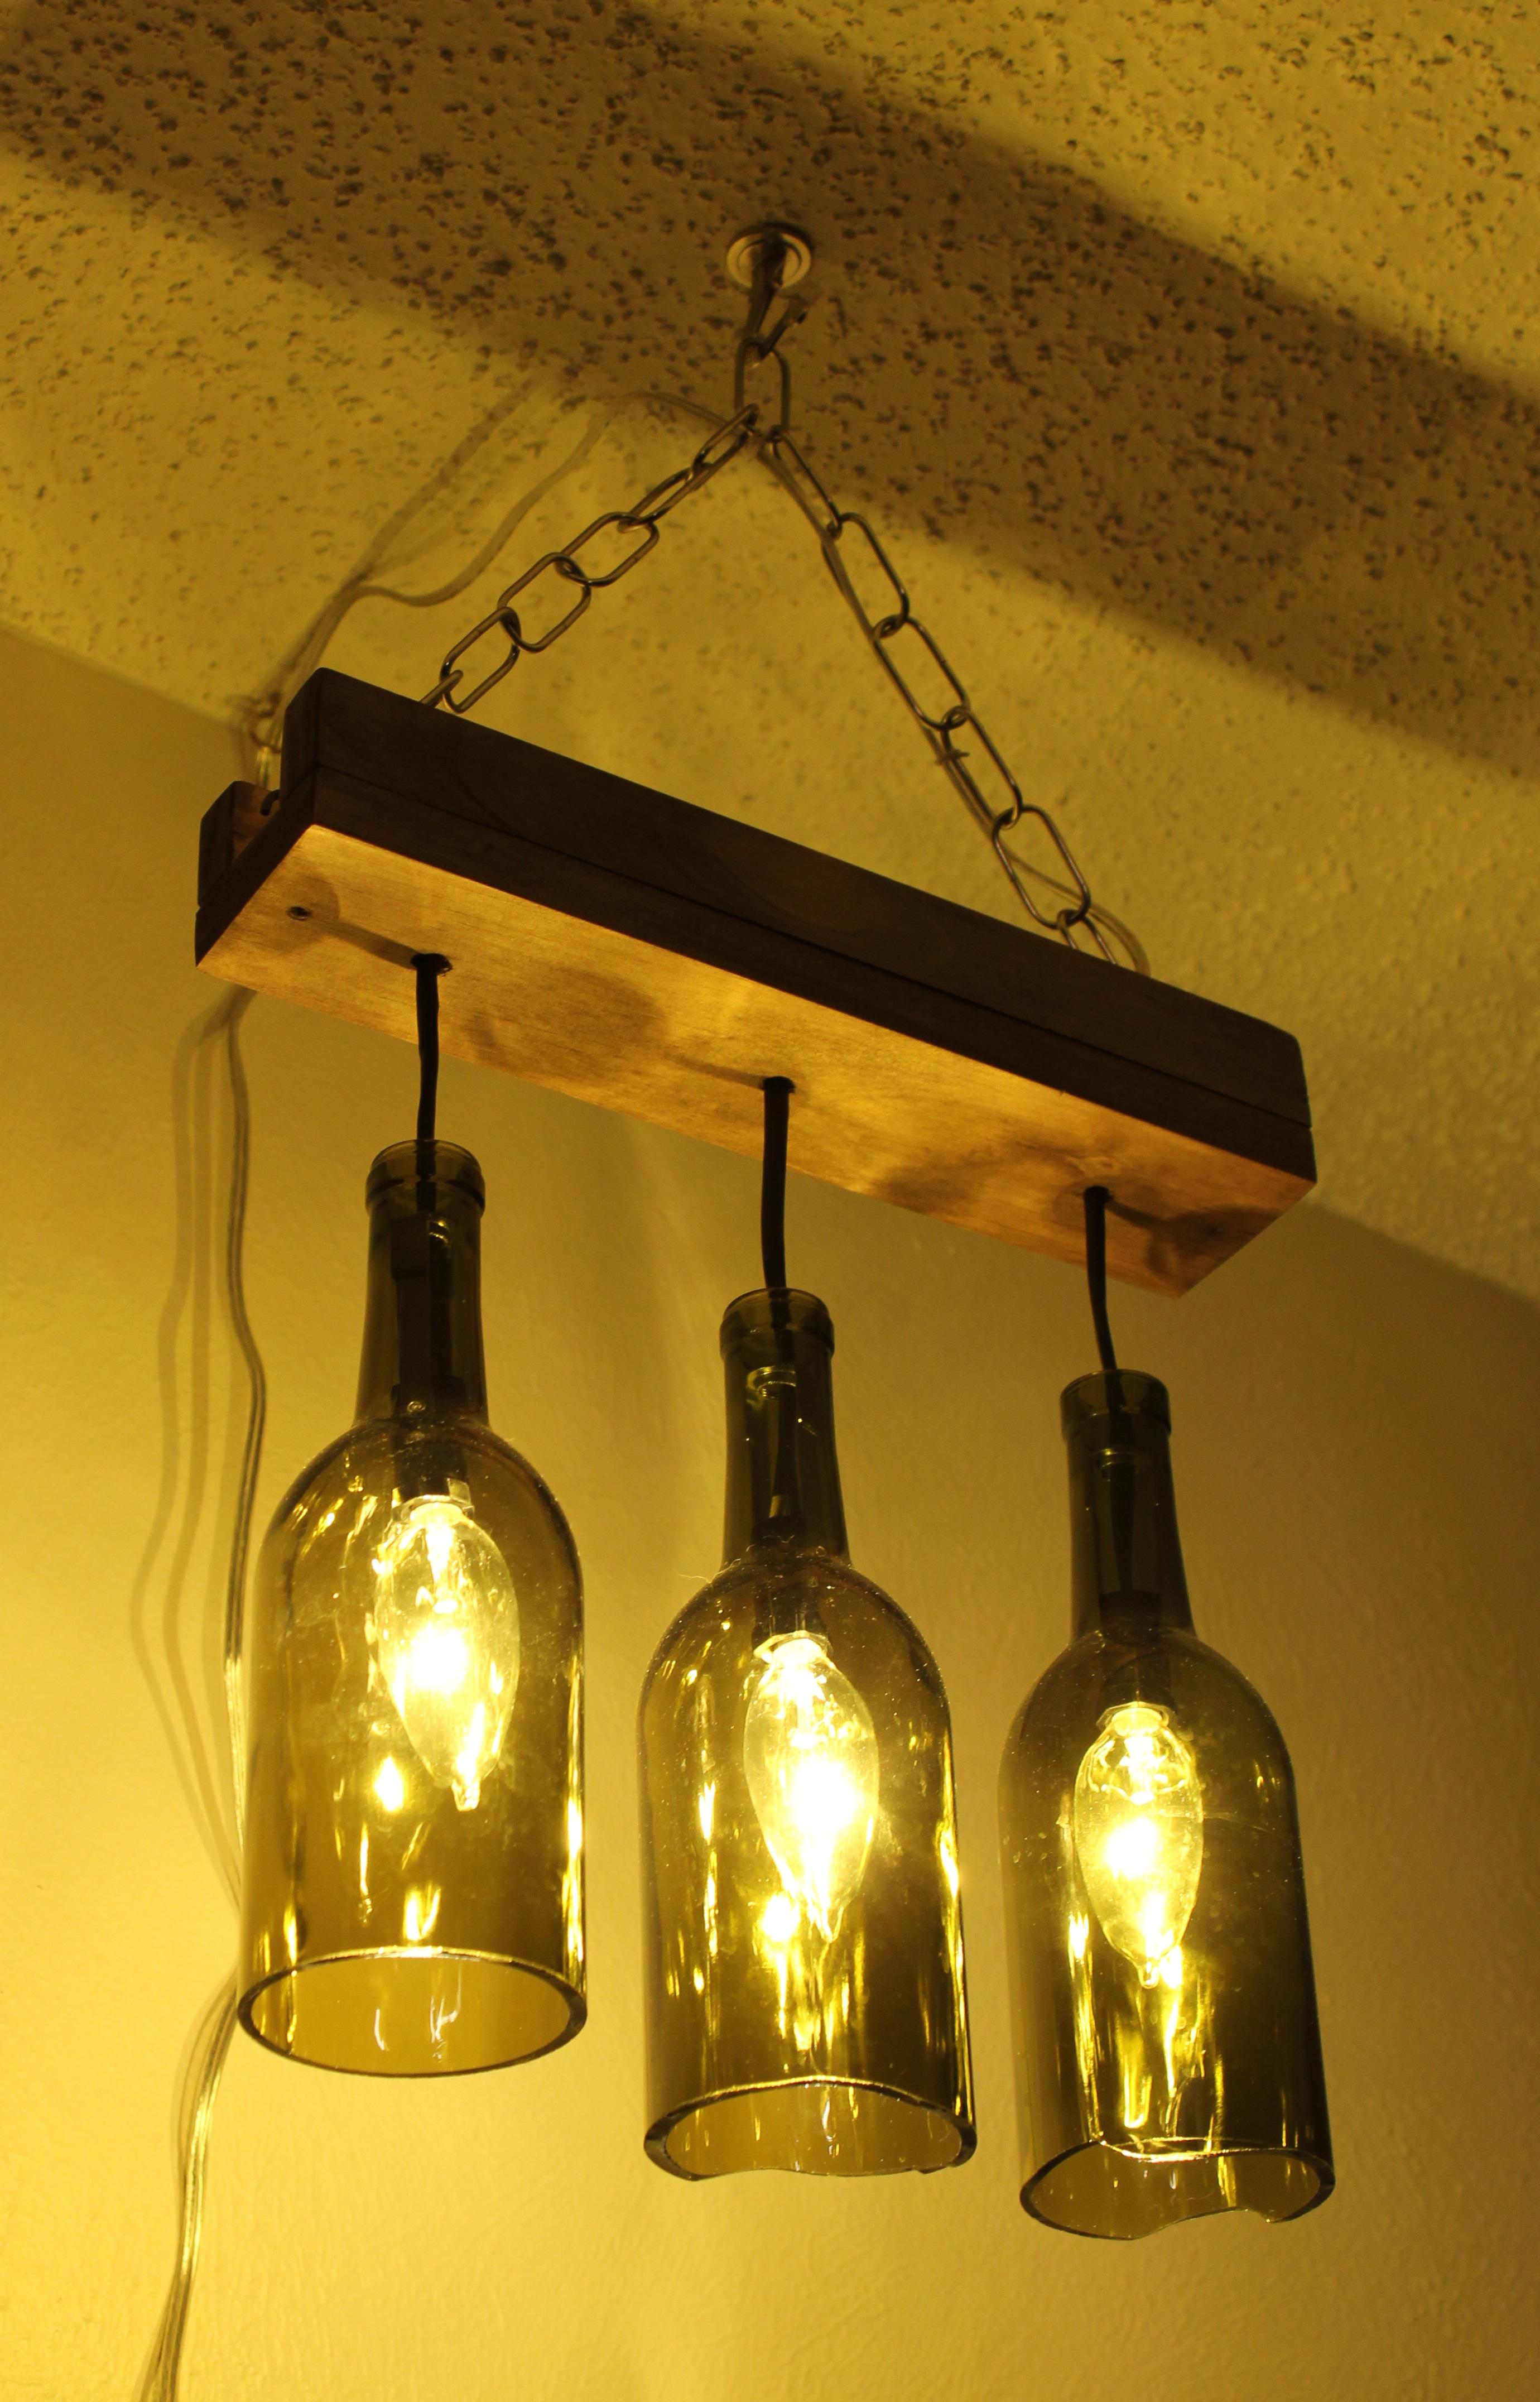 Making a wine bottle chandelier  Laura Makes